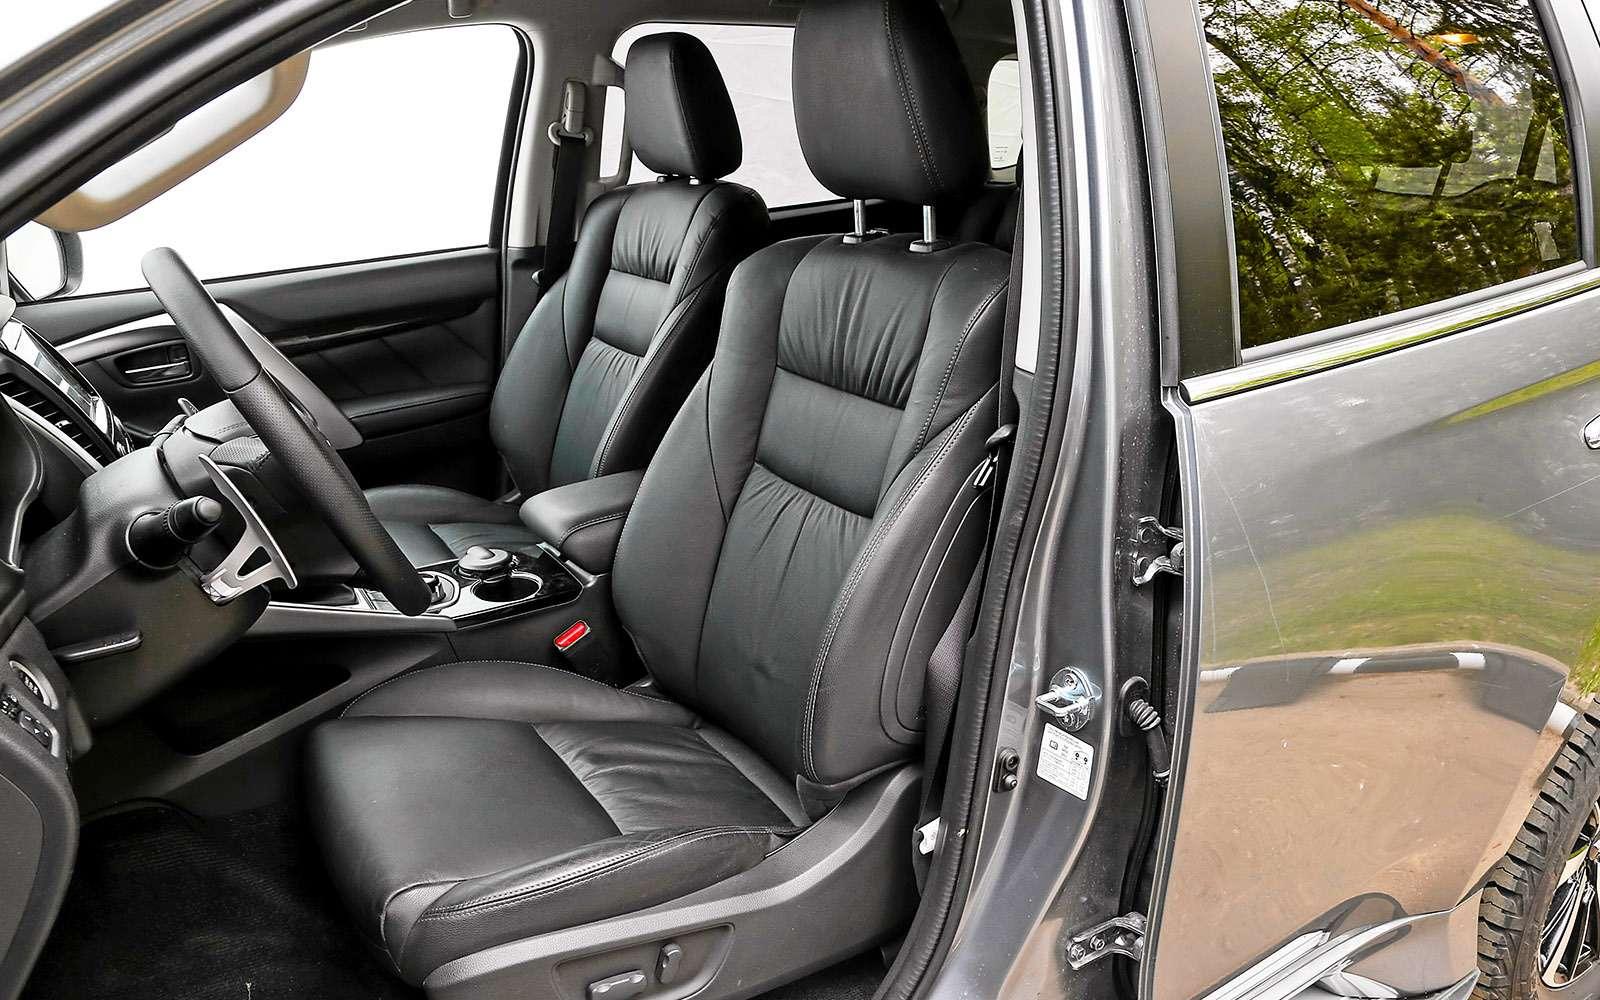 Mitsubishi Pajero Sport иKia Mohave— сравнительный тест настоящих внедорожников— фото 769873